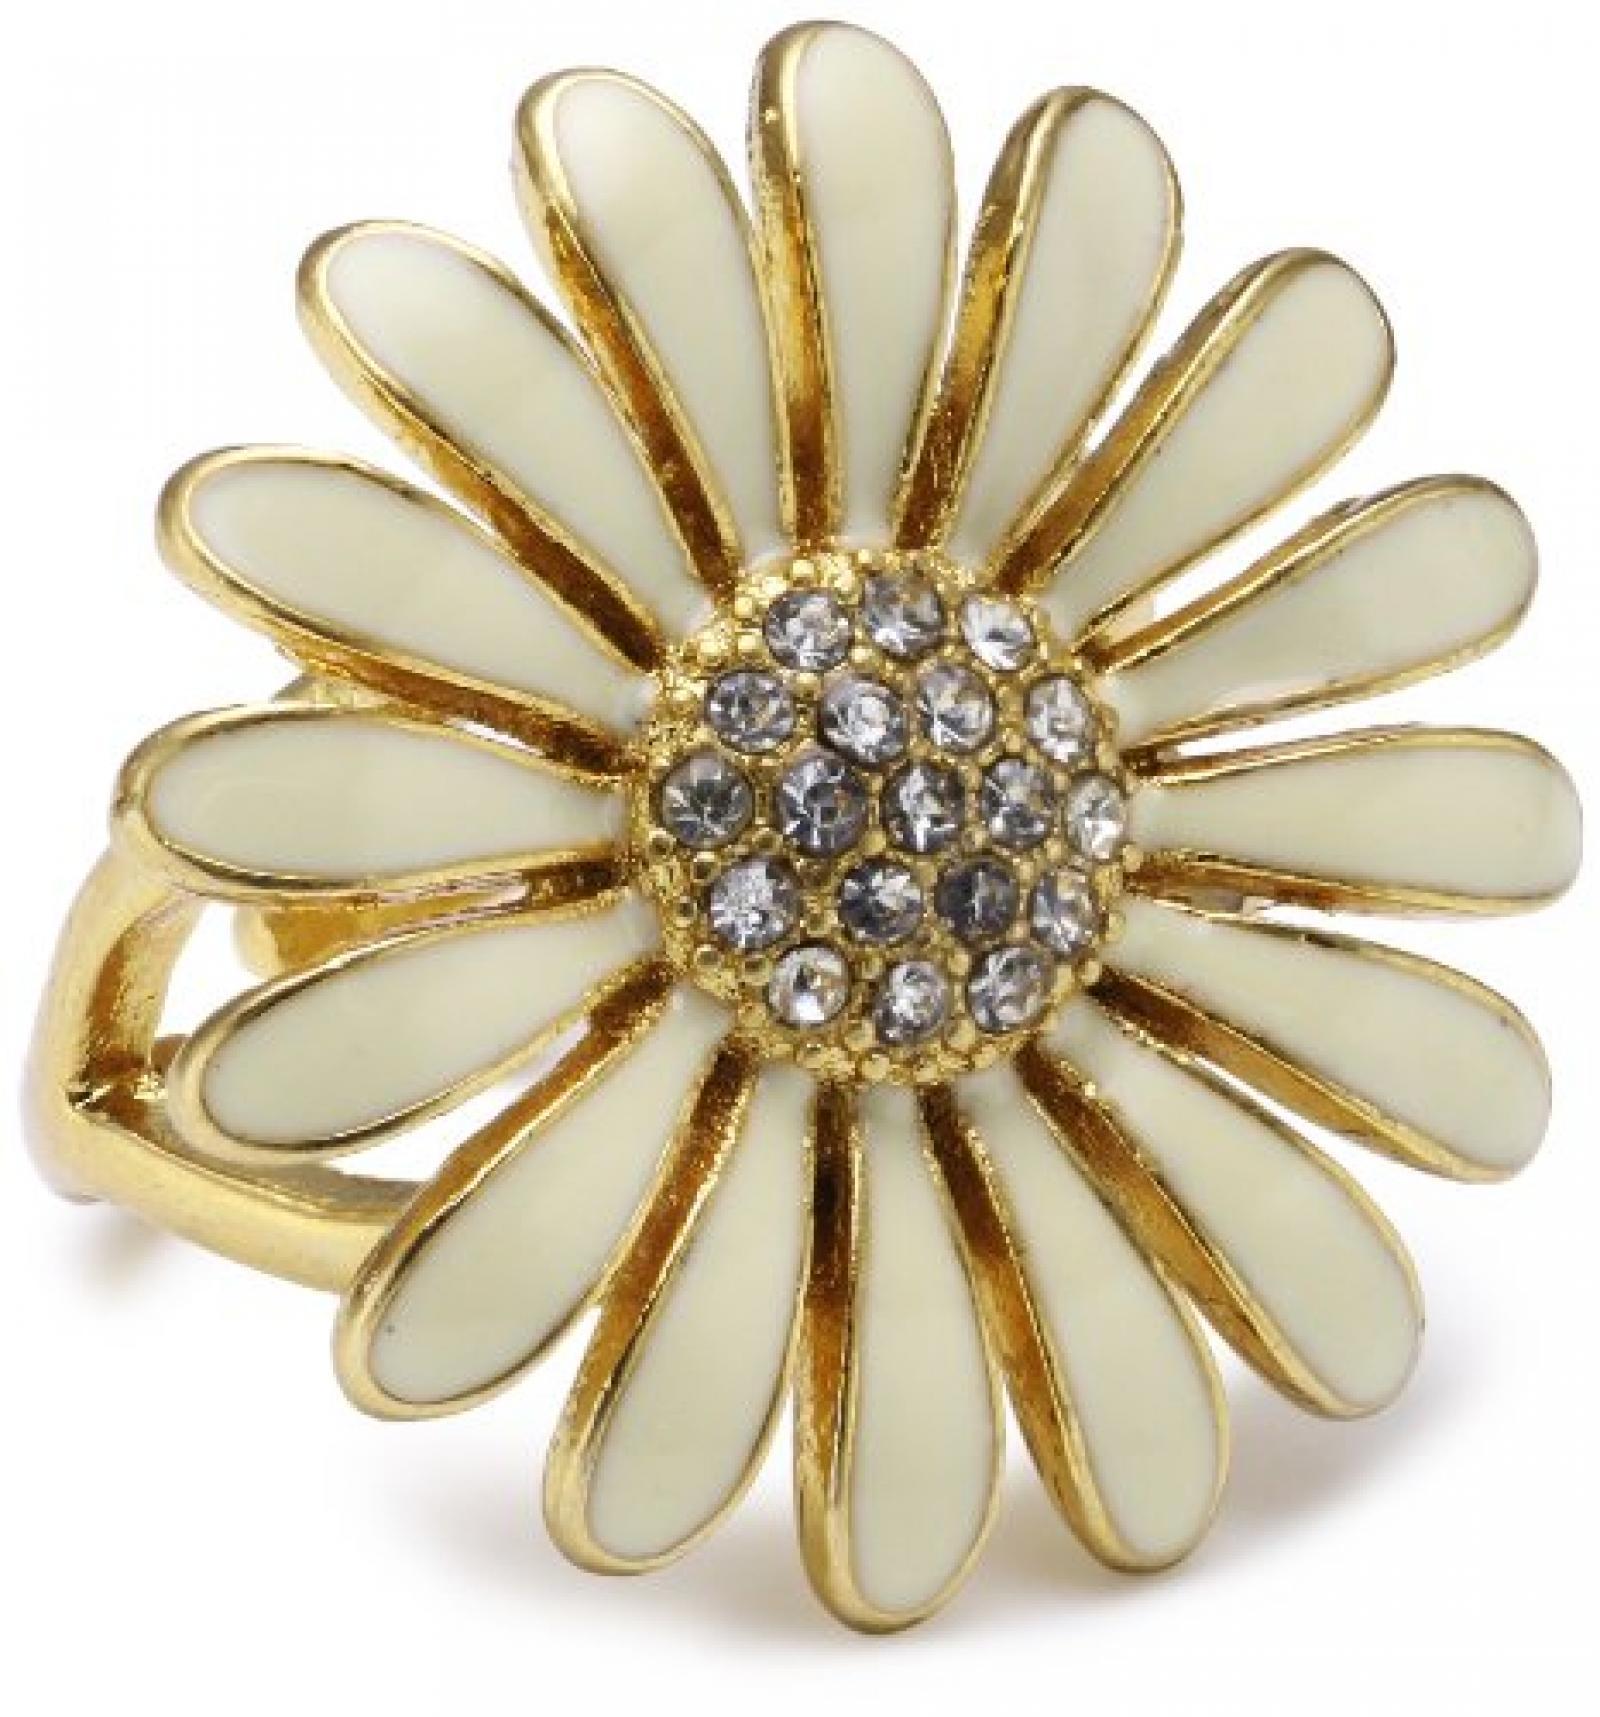 Pilgrim Jewelry Damen-Ring Blume vergoldet weiss 2.6 cm verstellbar Gr. 51-59 171312004